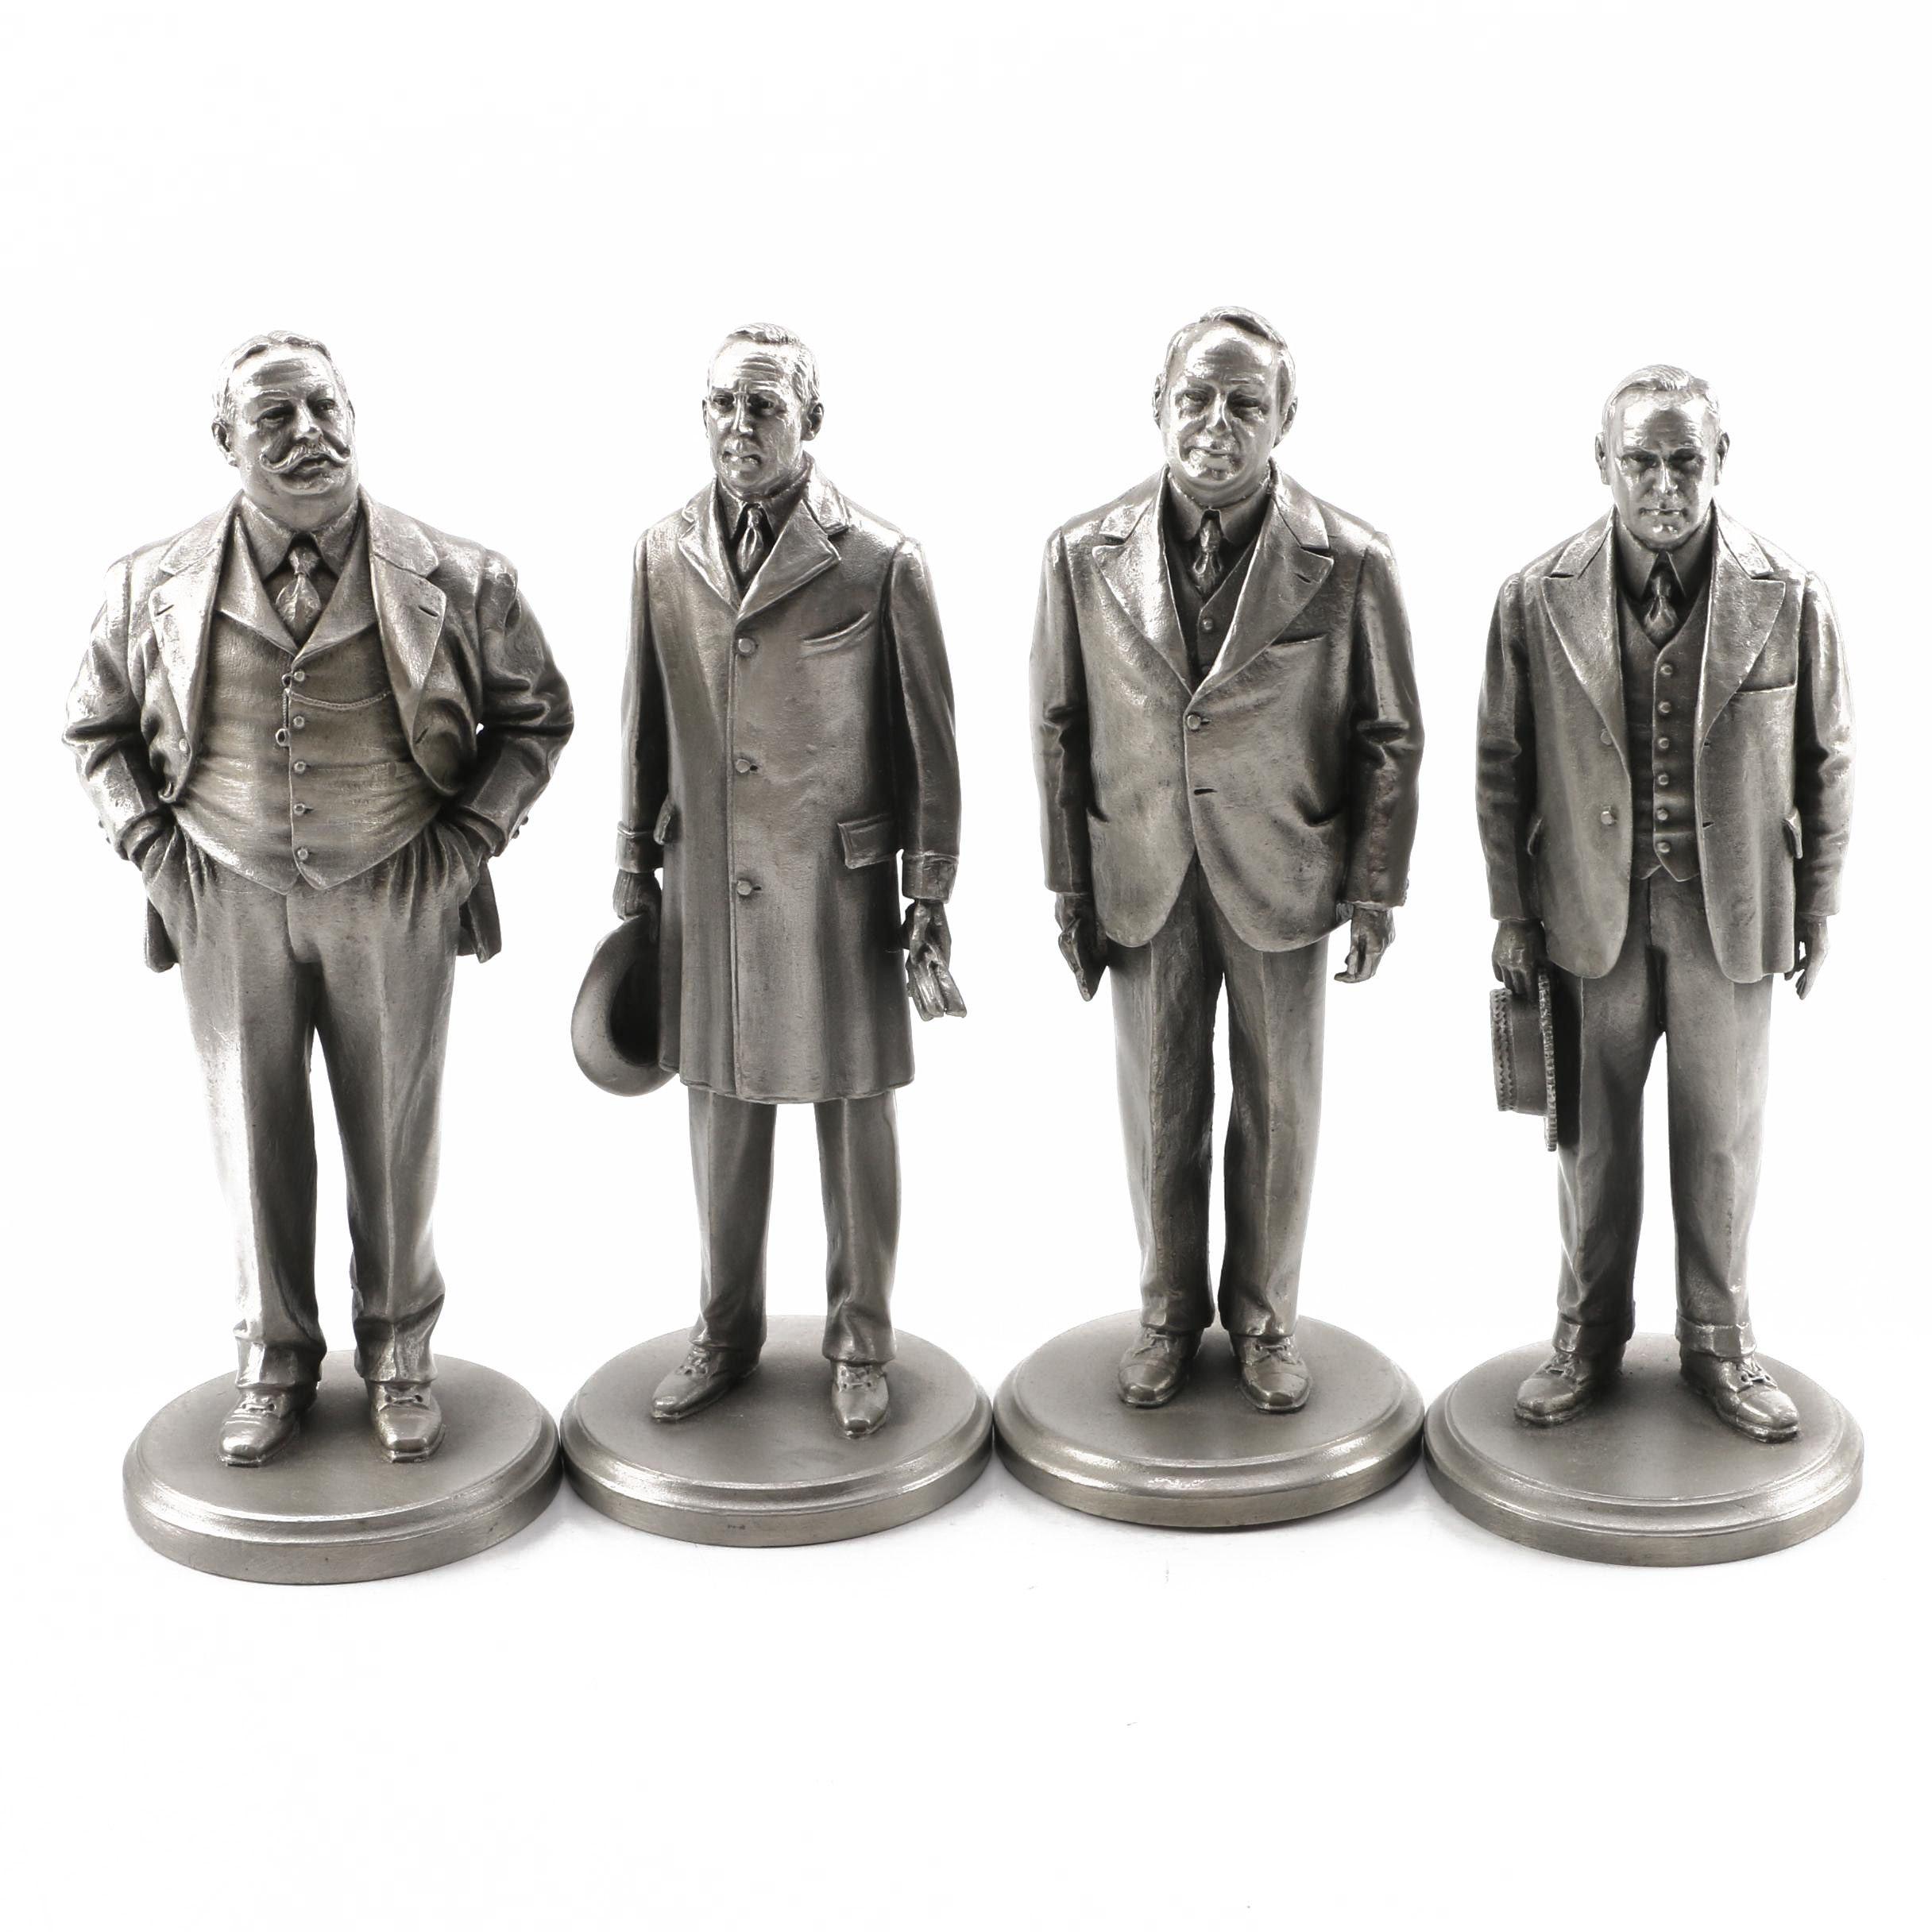 Lance Pewter President Figurines including Taft, Wilson, Harding, and Coolidge